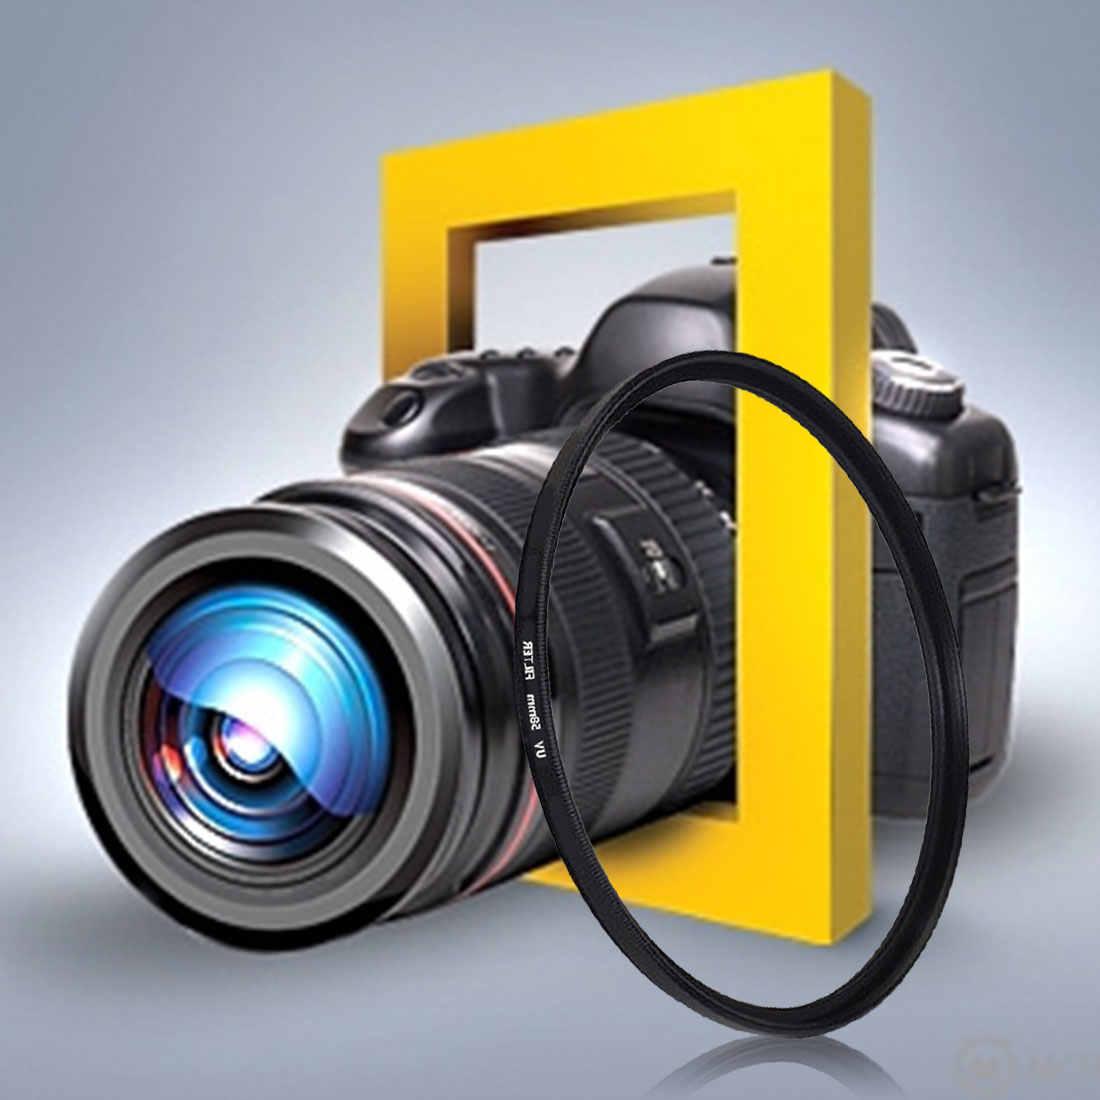 30.5mm 37mm 40.5mm 43mm 46mm 49mm 52mm 55mm 58mm 62mm 67mm 72mm 77mm 82mm UV filtre Canon nikon sony Pentax kamera Lens